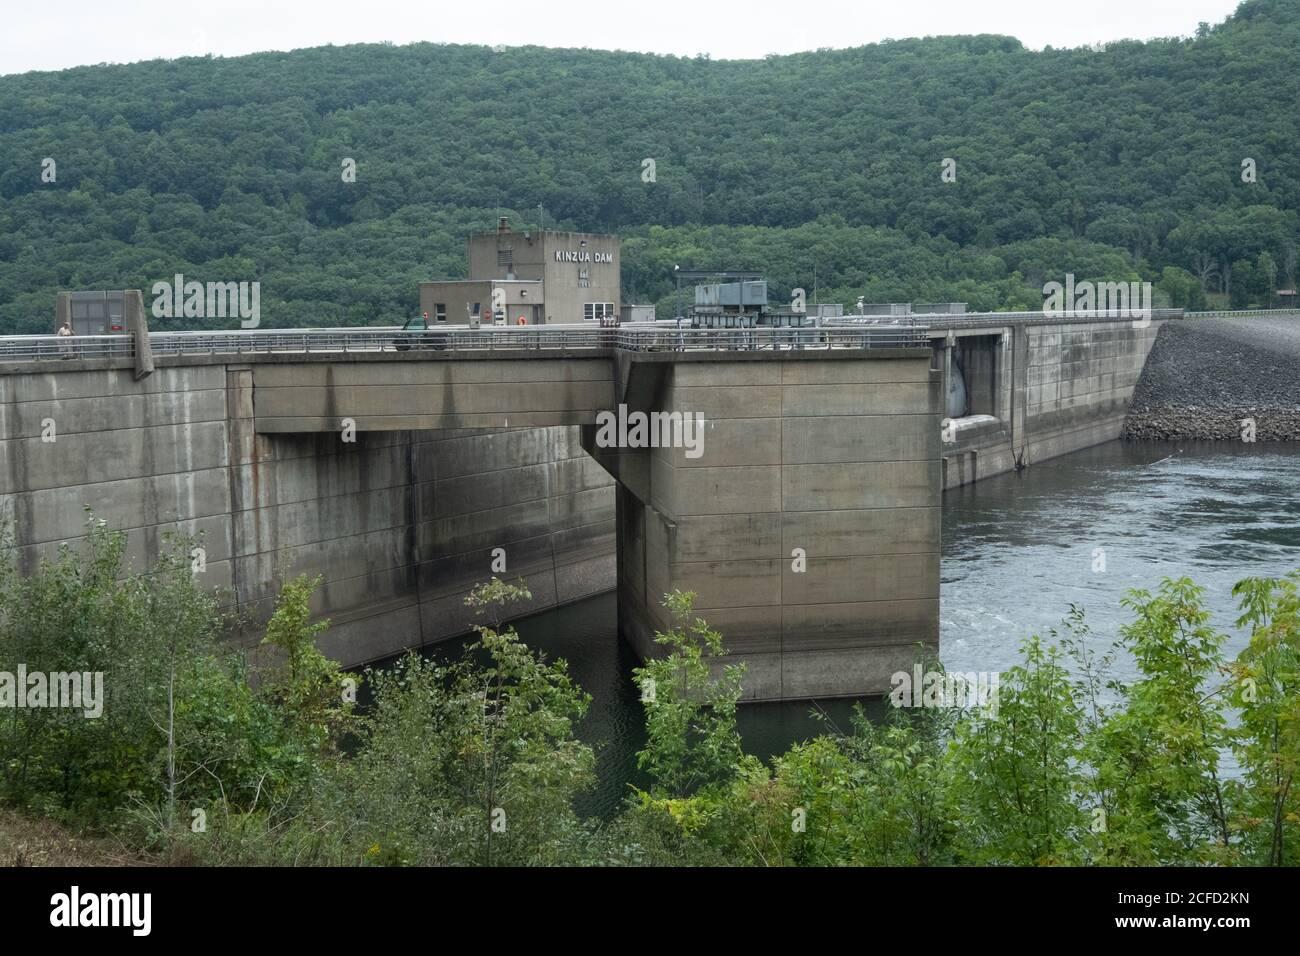 Kinzua Dam Power Station, Warren County, Allegheny National Forest, Pennsylvania, USA Stockfoto